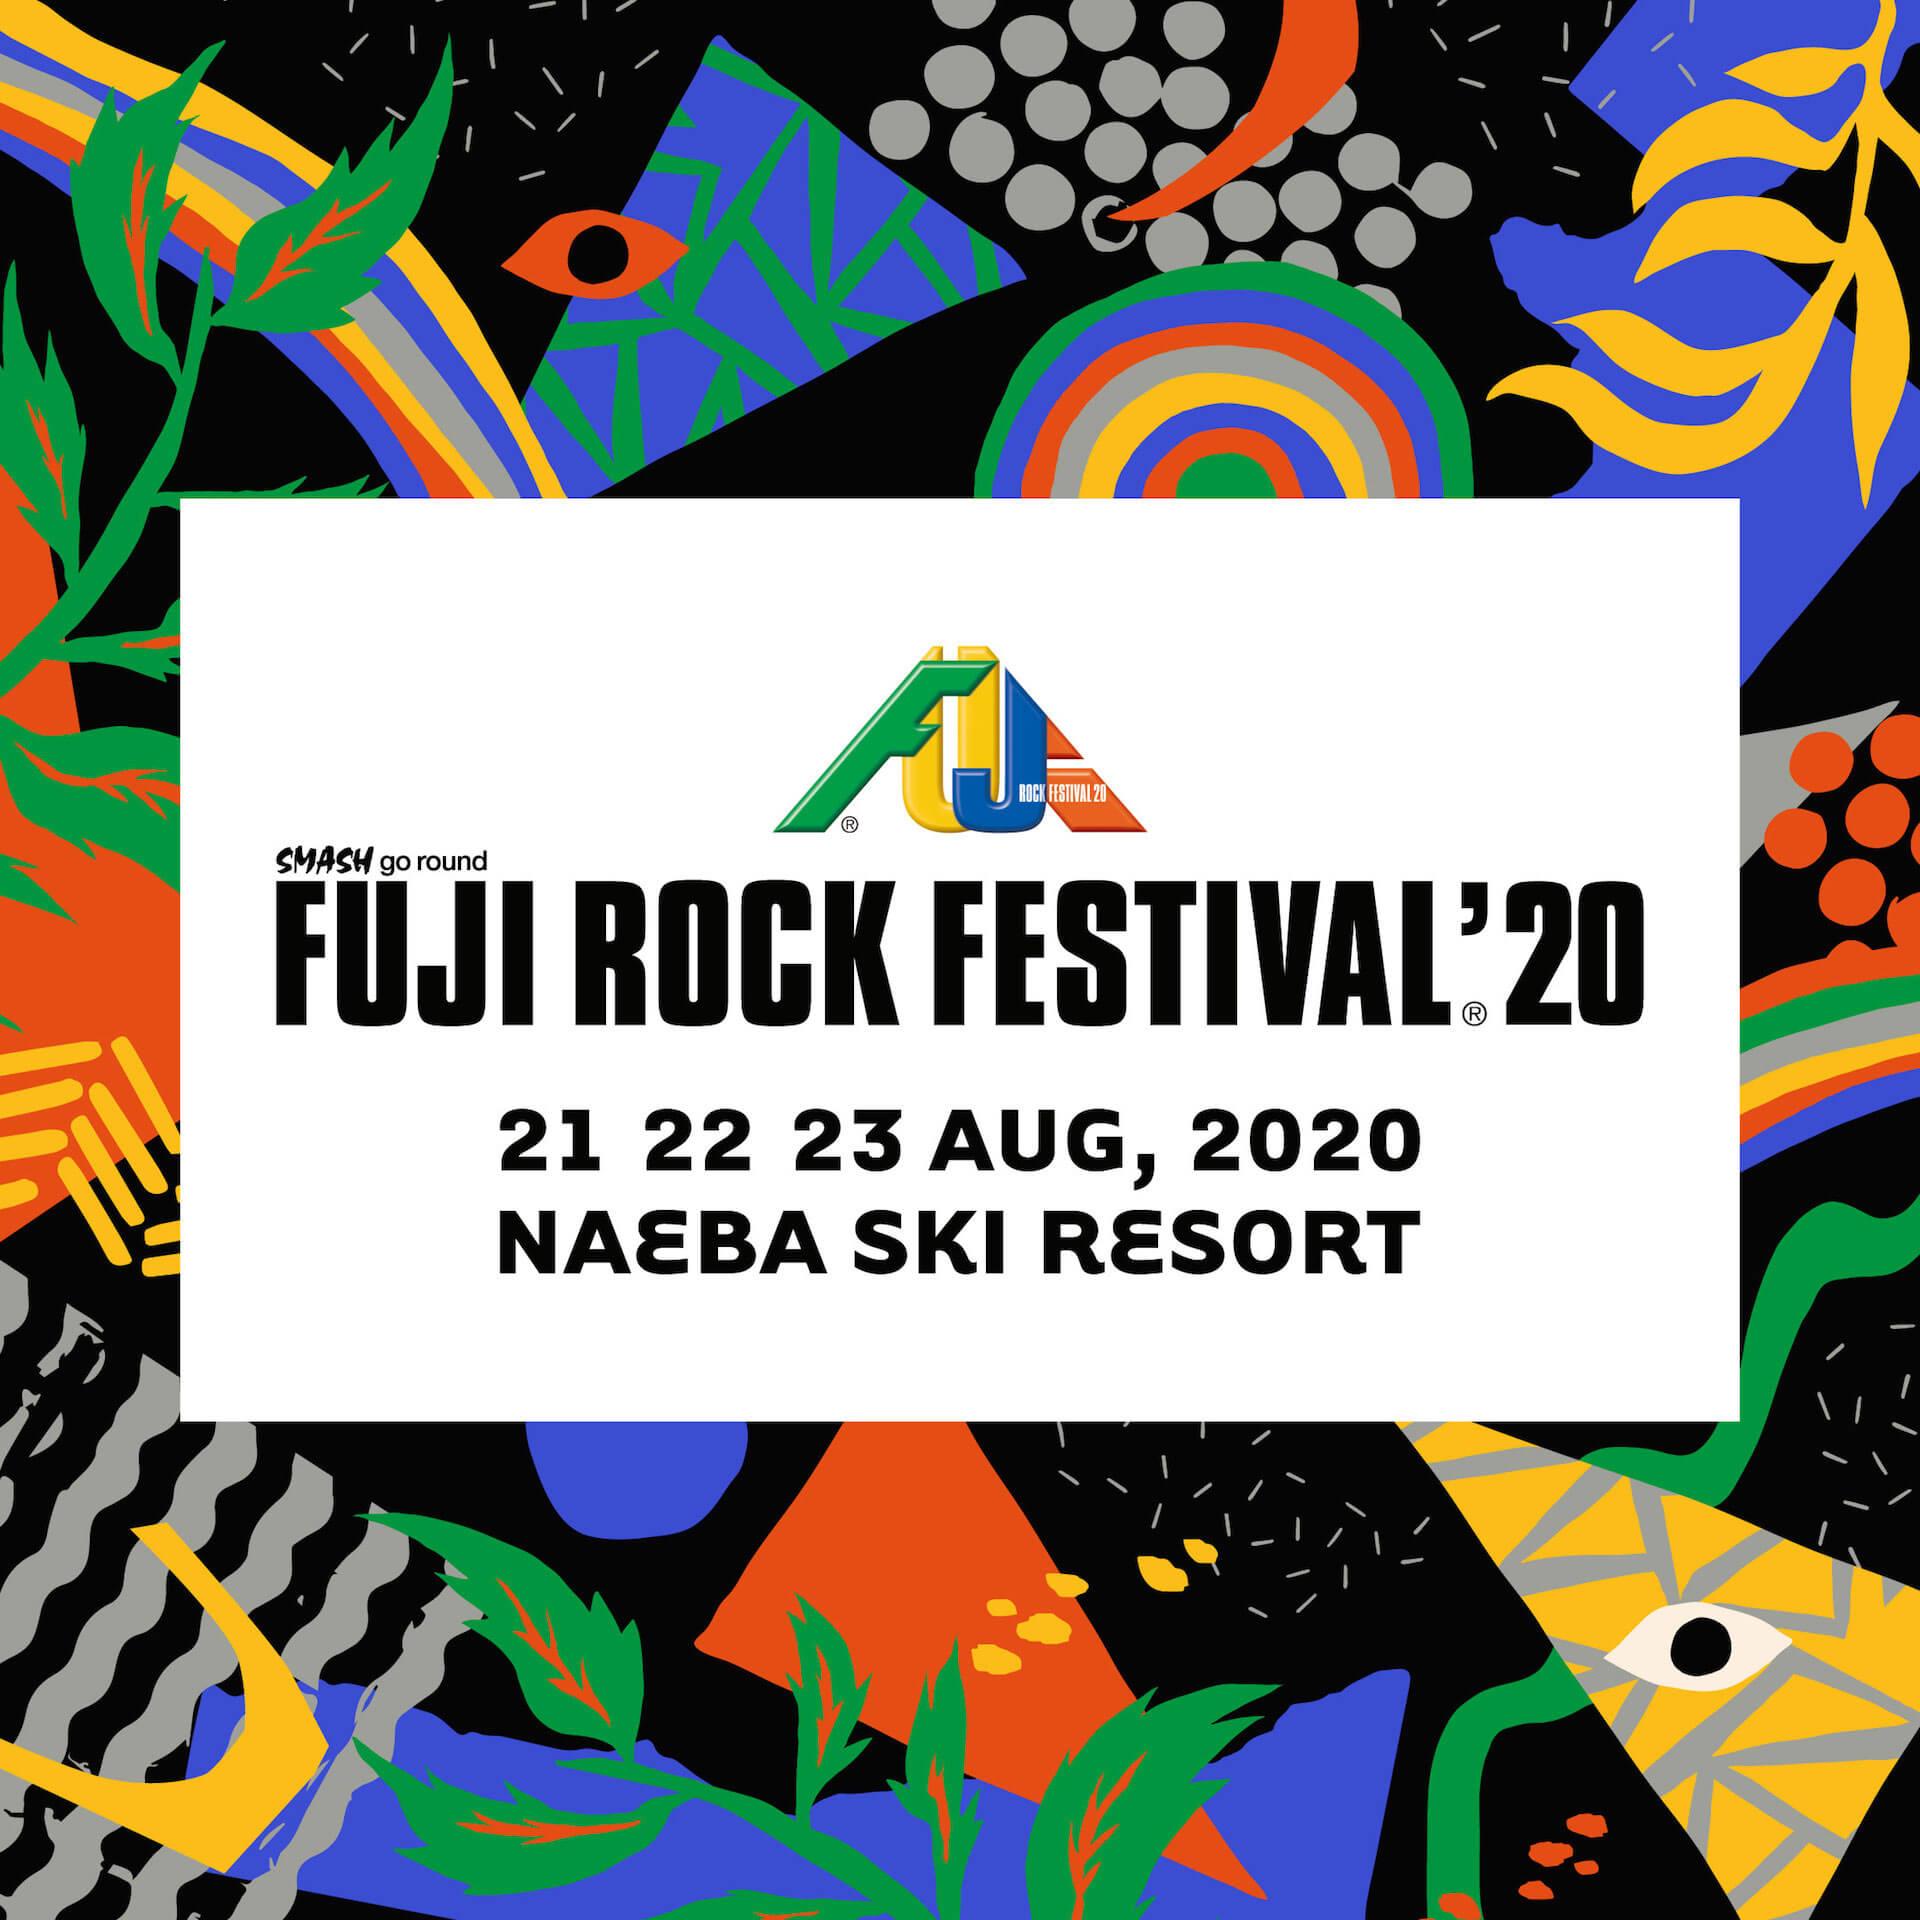 <FUJI ROCK FESTIVAL '20>のチケット第1次先行販売がコロナウイルスの影響で延期に|第1弾アーティスト発表日時解禁! music200302_fujirock_main